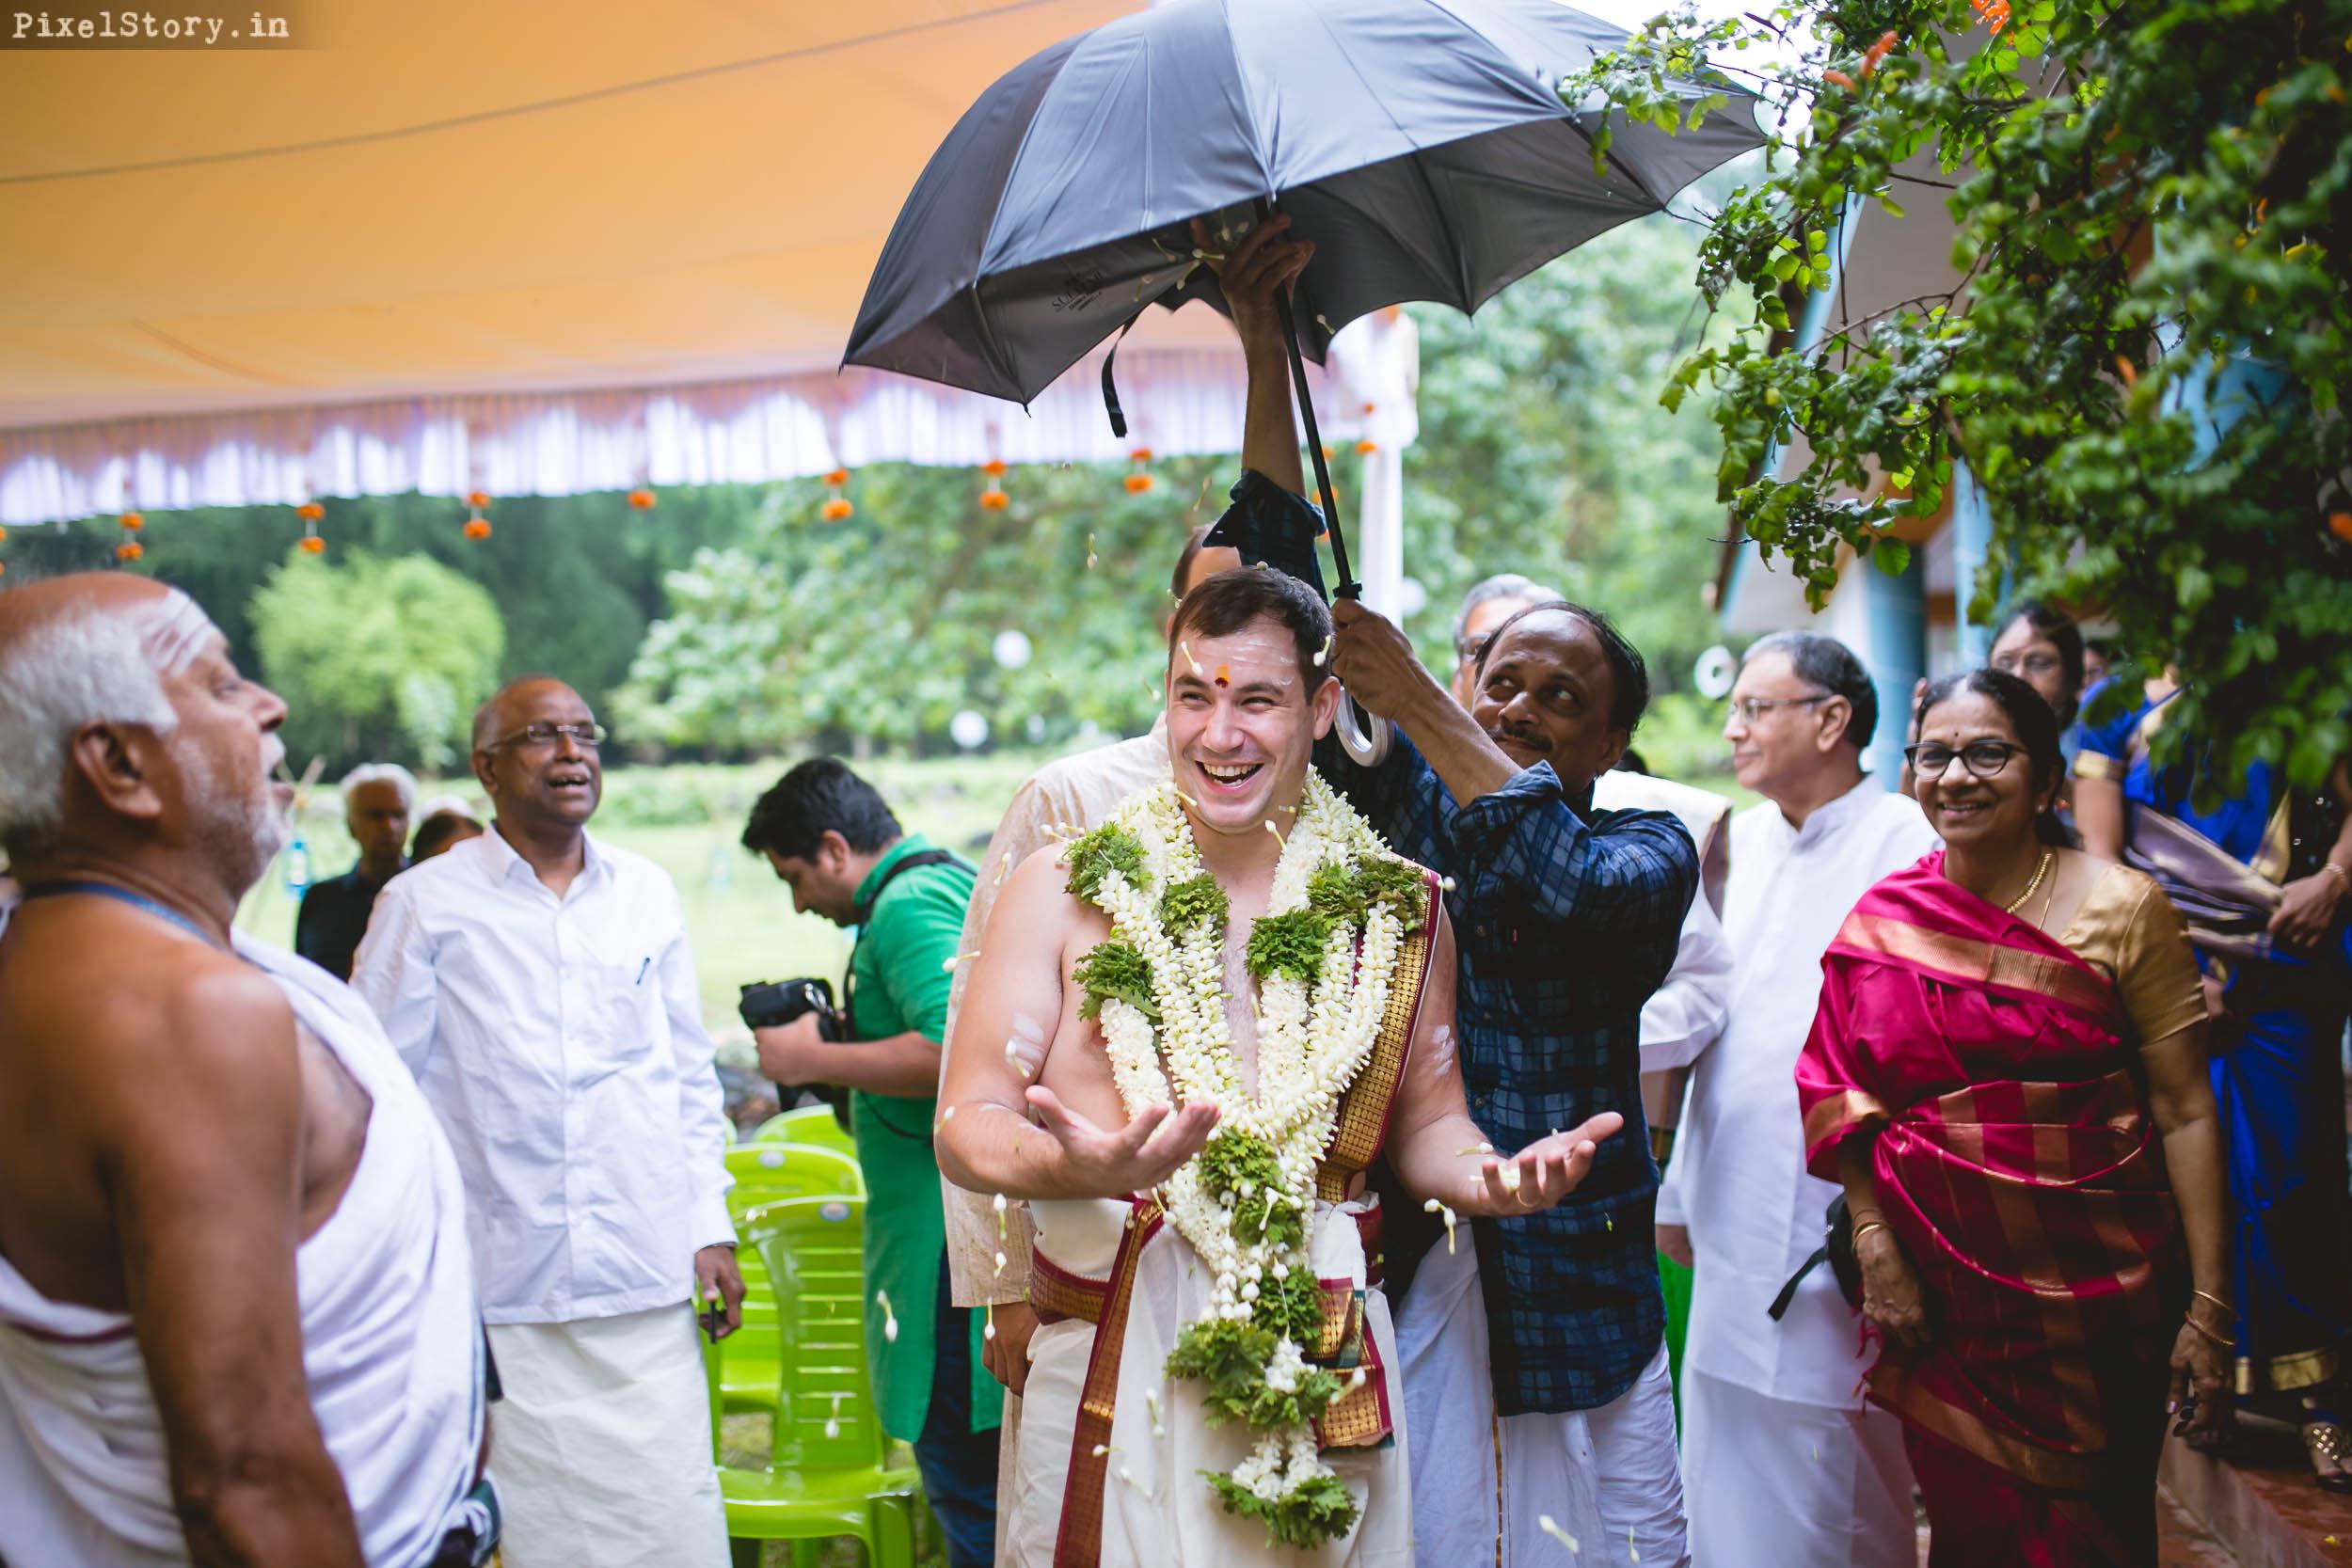 PixelStory-Jungle-Wedding-Photographer-Masinagudi-Indo-French028.jpg